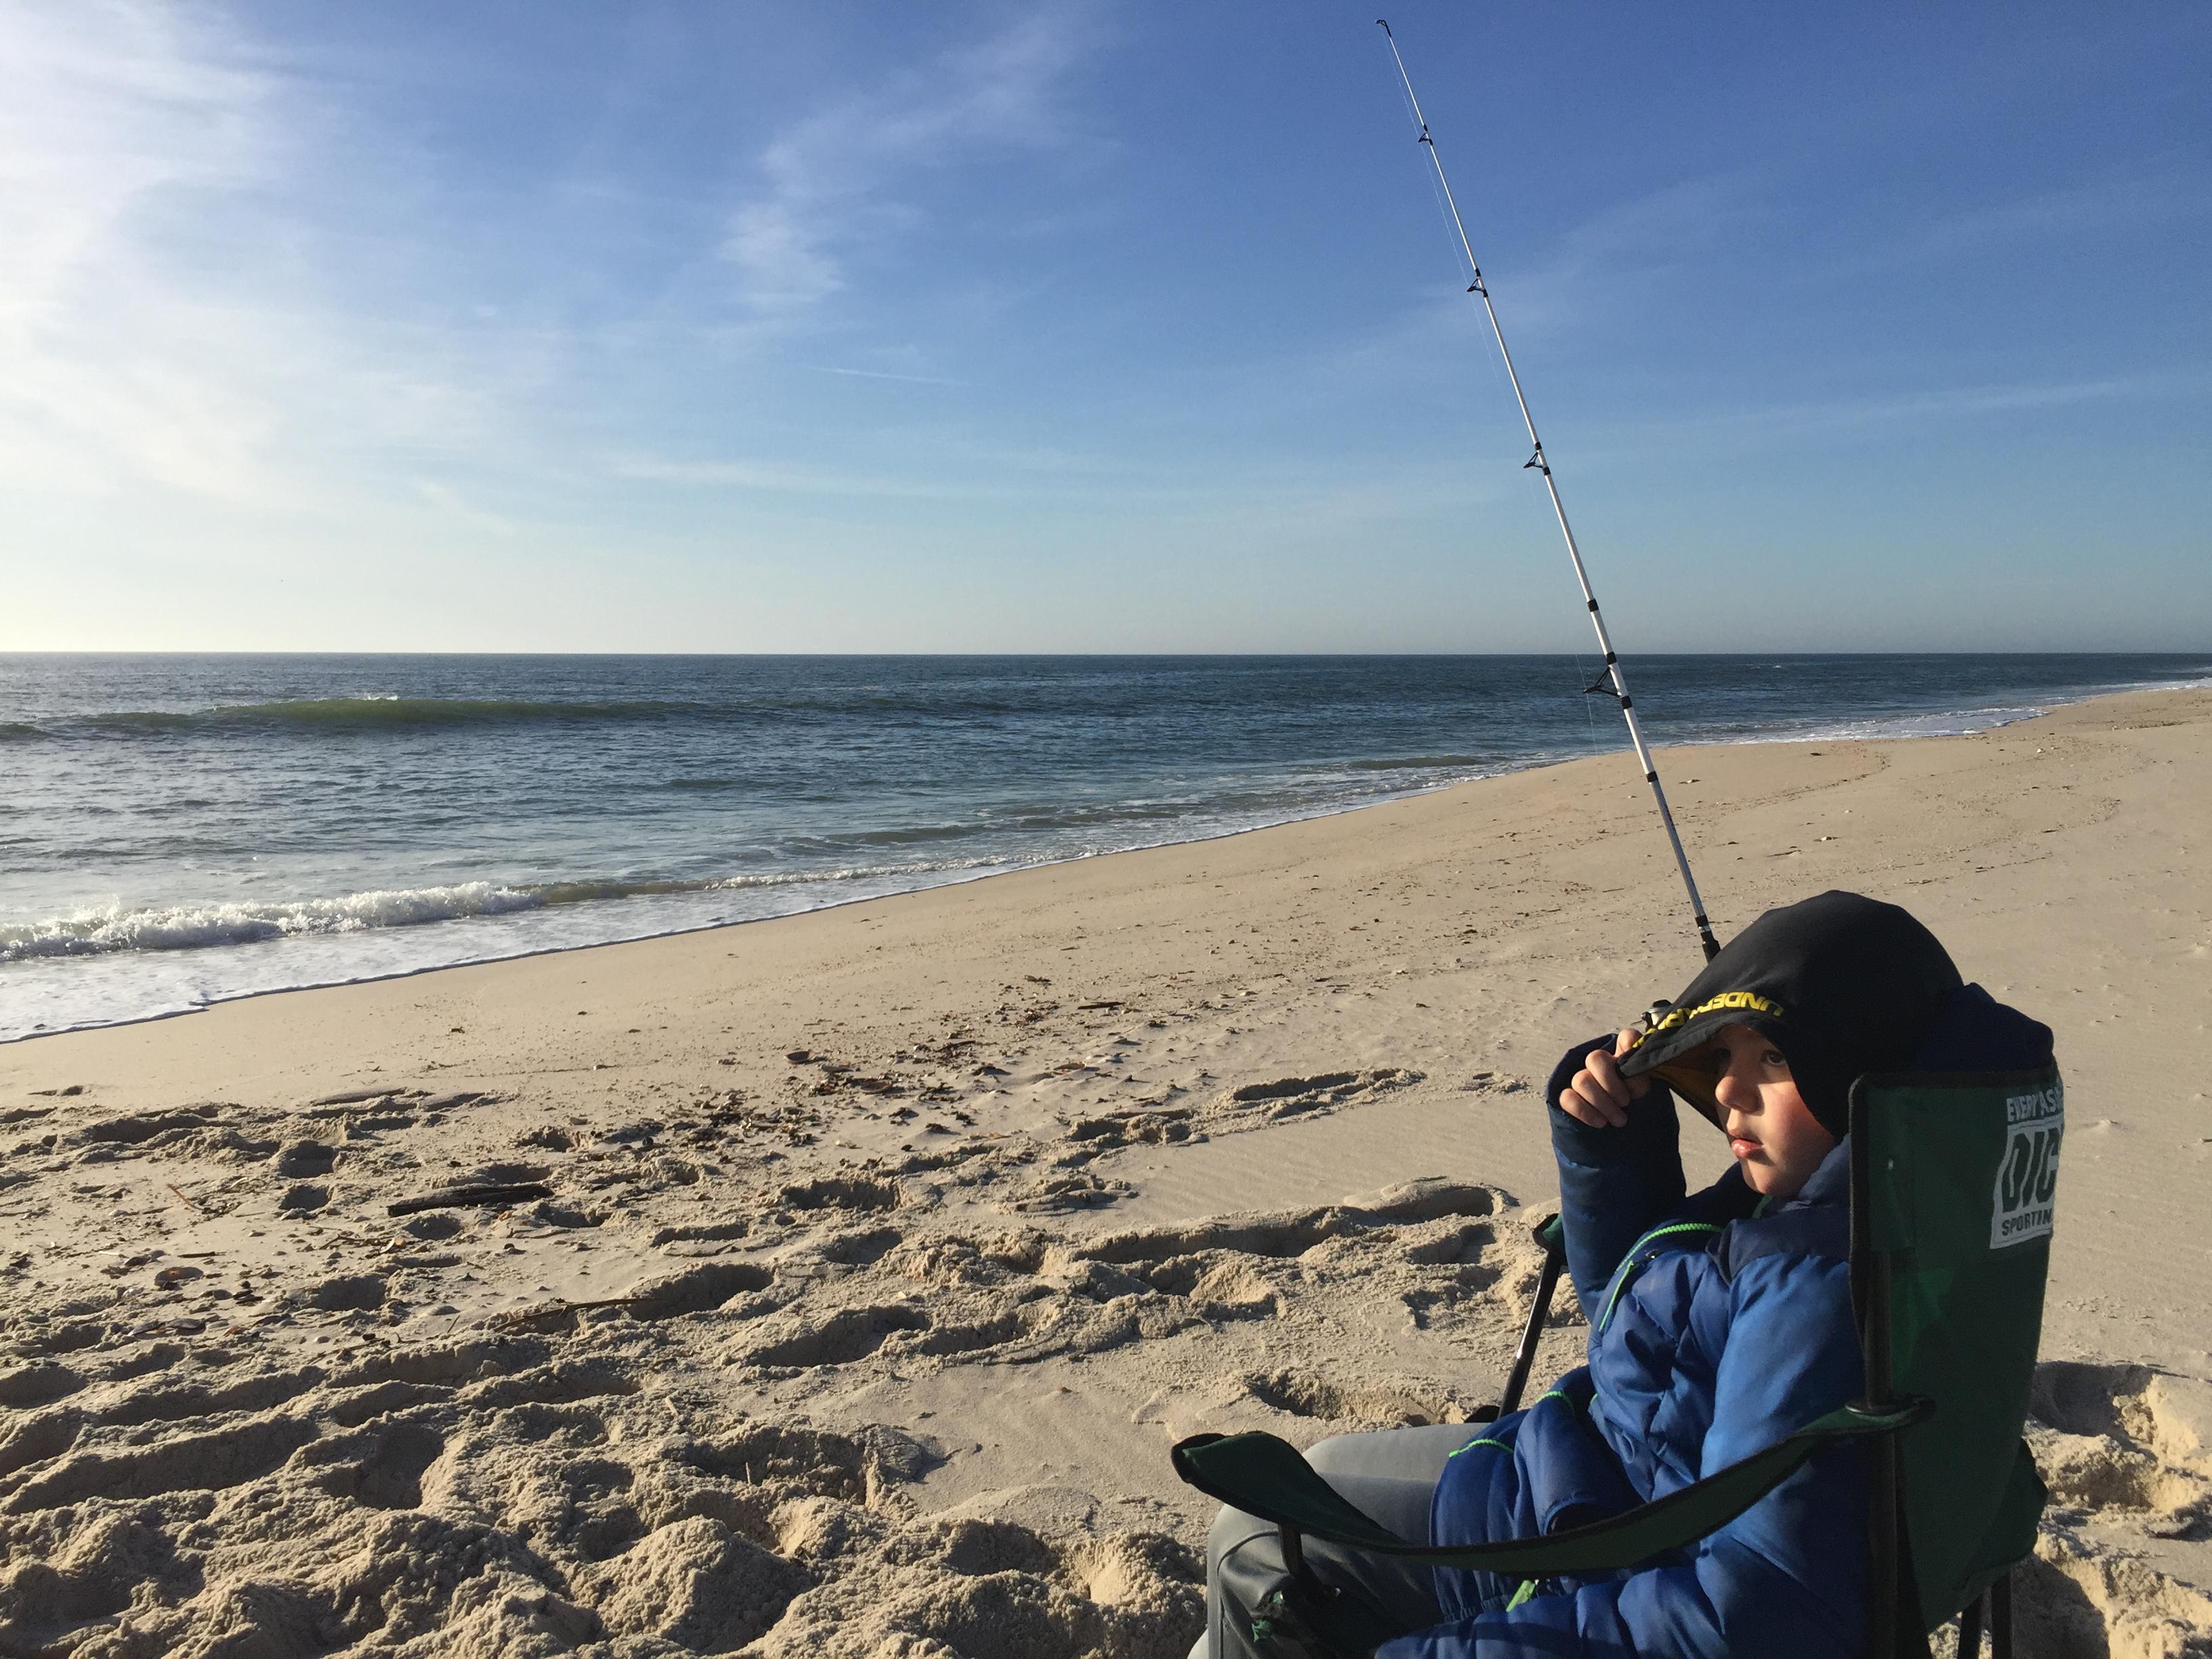 Bear Stripers surf fishing - fishing - hunting new york - ny empire state